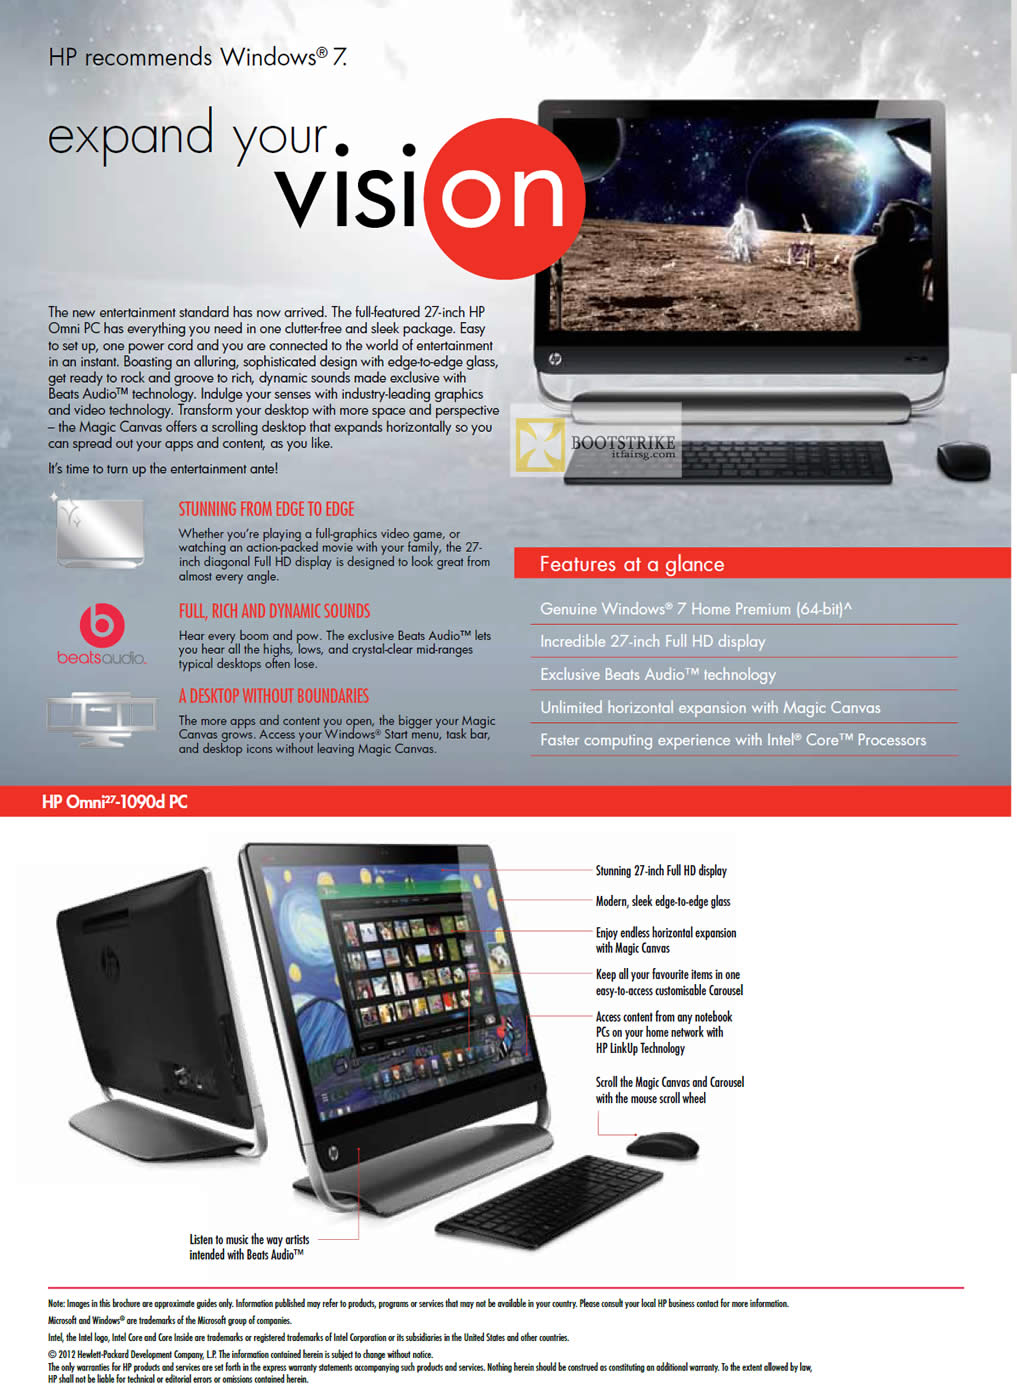 IT SHOW 2012 price list image brochure of HP AIO Desktop PC Omni27-1090d, Features